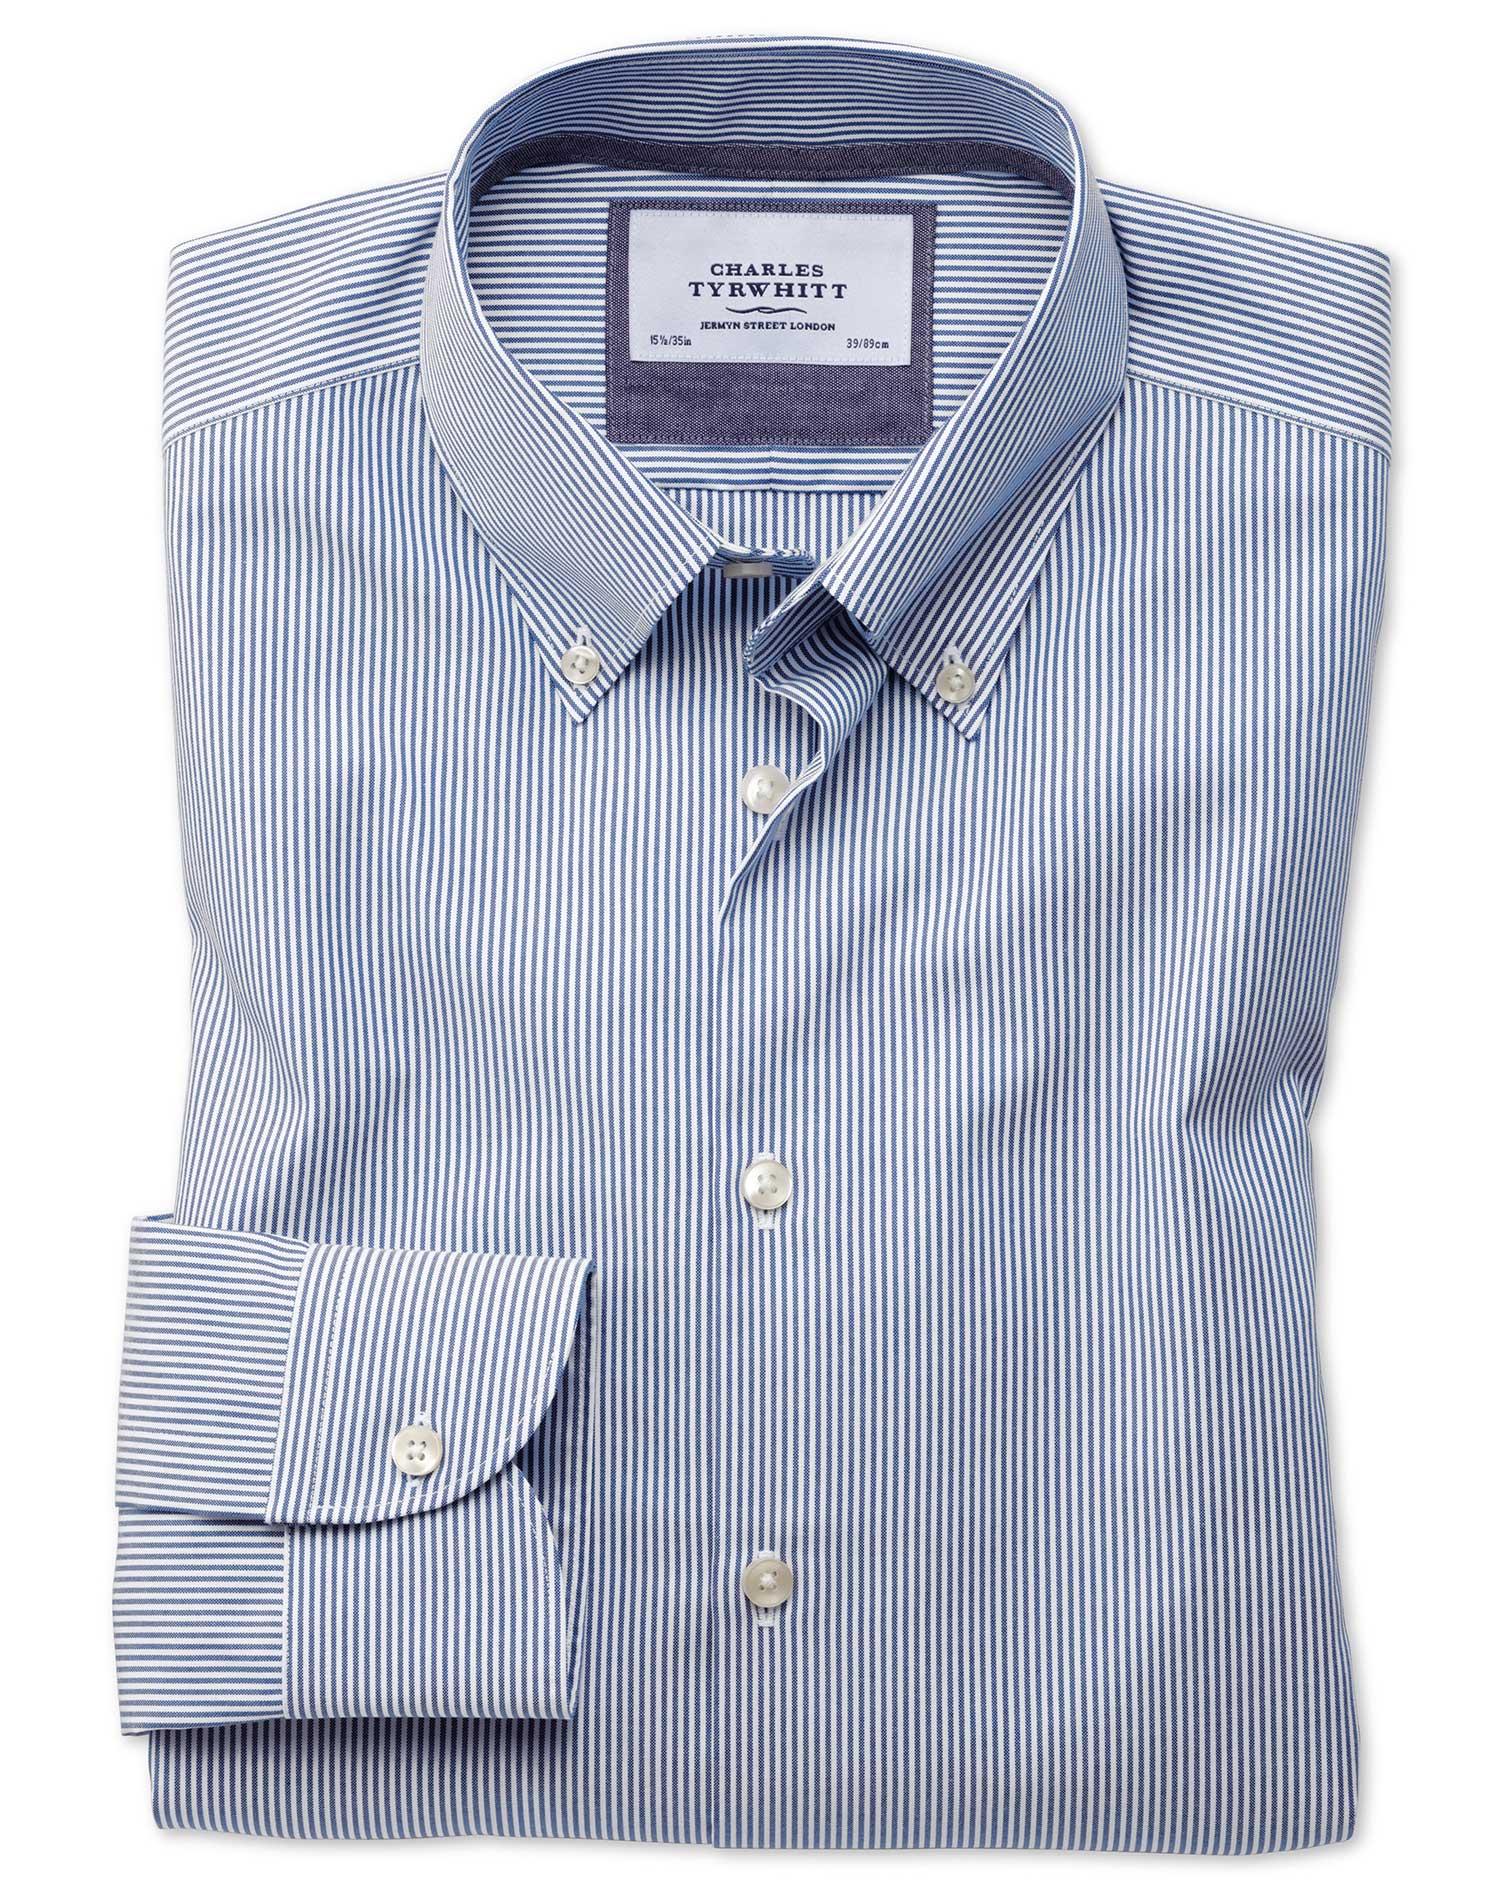 Classic Fit Button-Down Business Casual Non-Iron Blue Stripe Cotton Formal Shirt Single Cuff Size 15